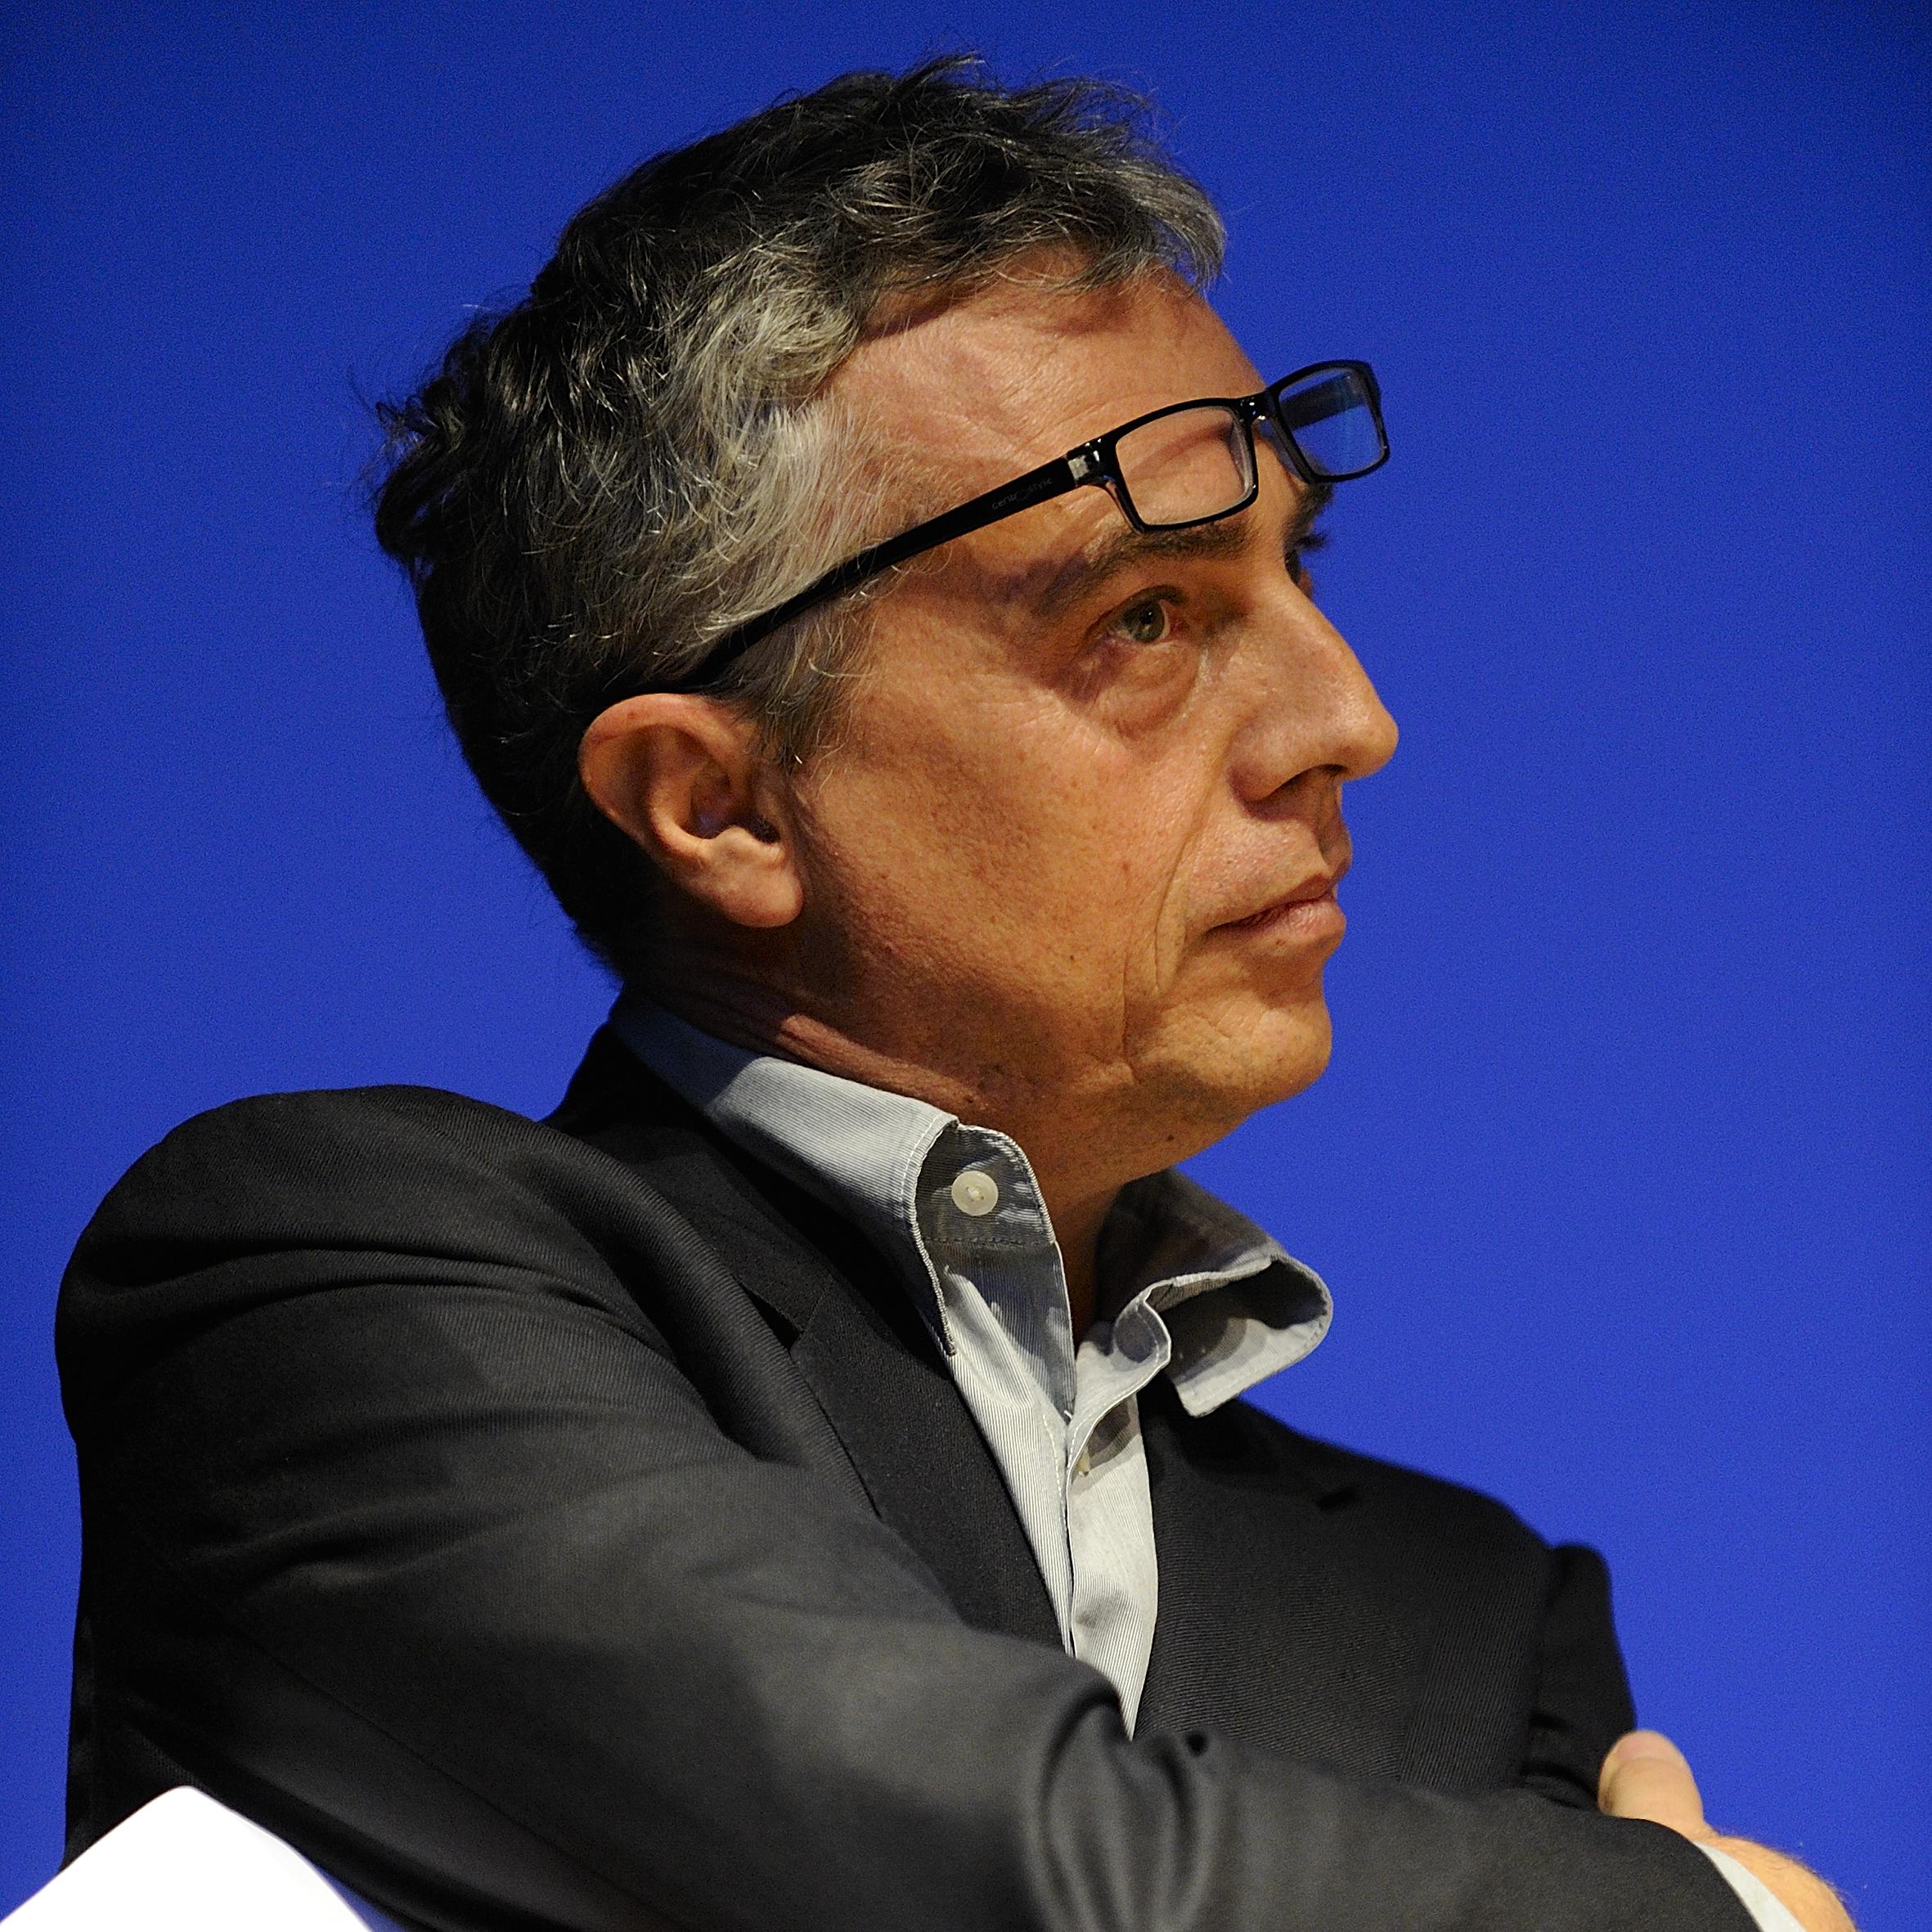 Stefano Boeri (courtesy photo: Ivan Sarfatti)